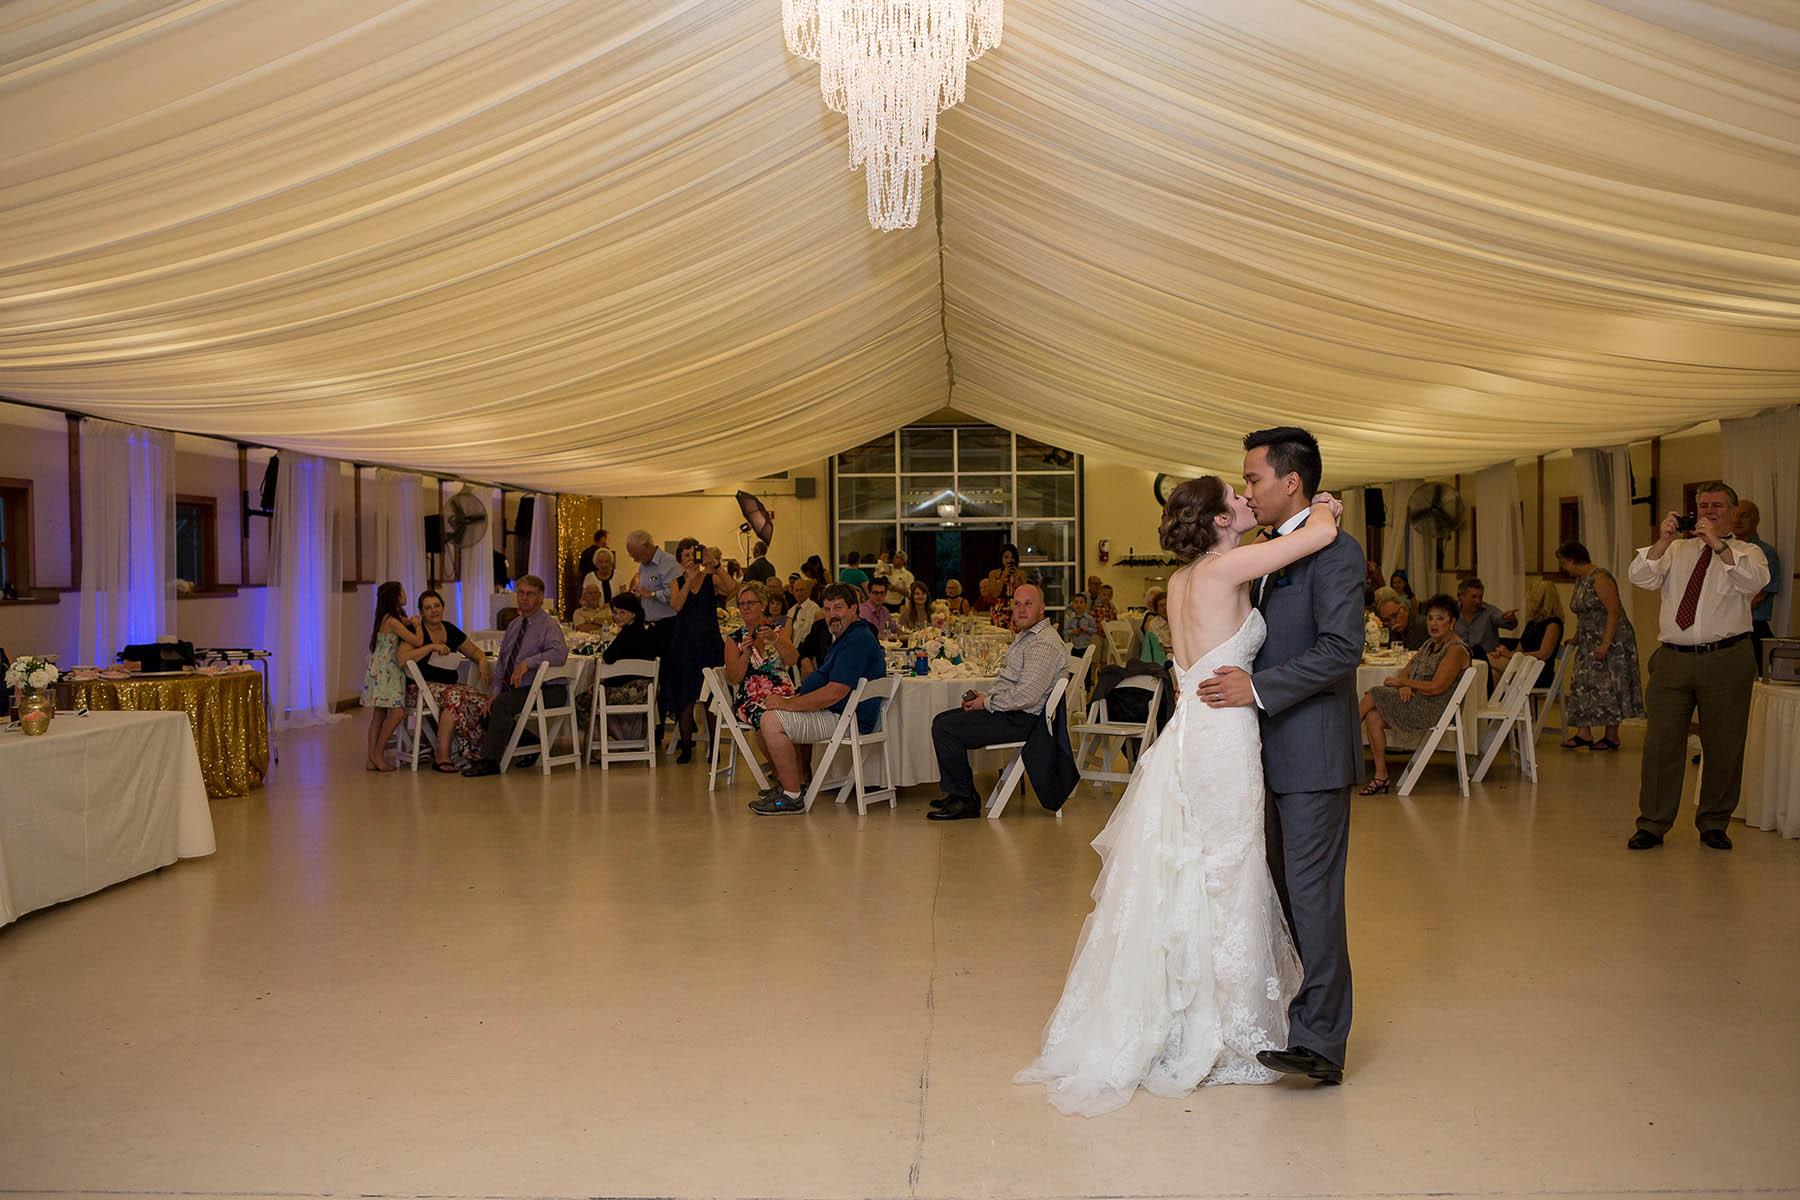 pickering-barn-issaquah-wedding-photography037.jpg